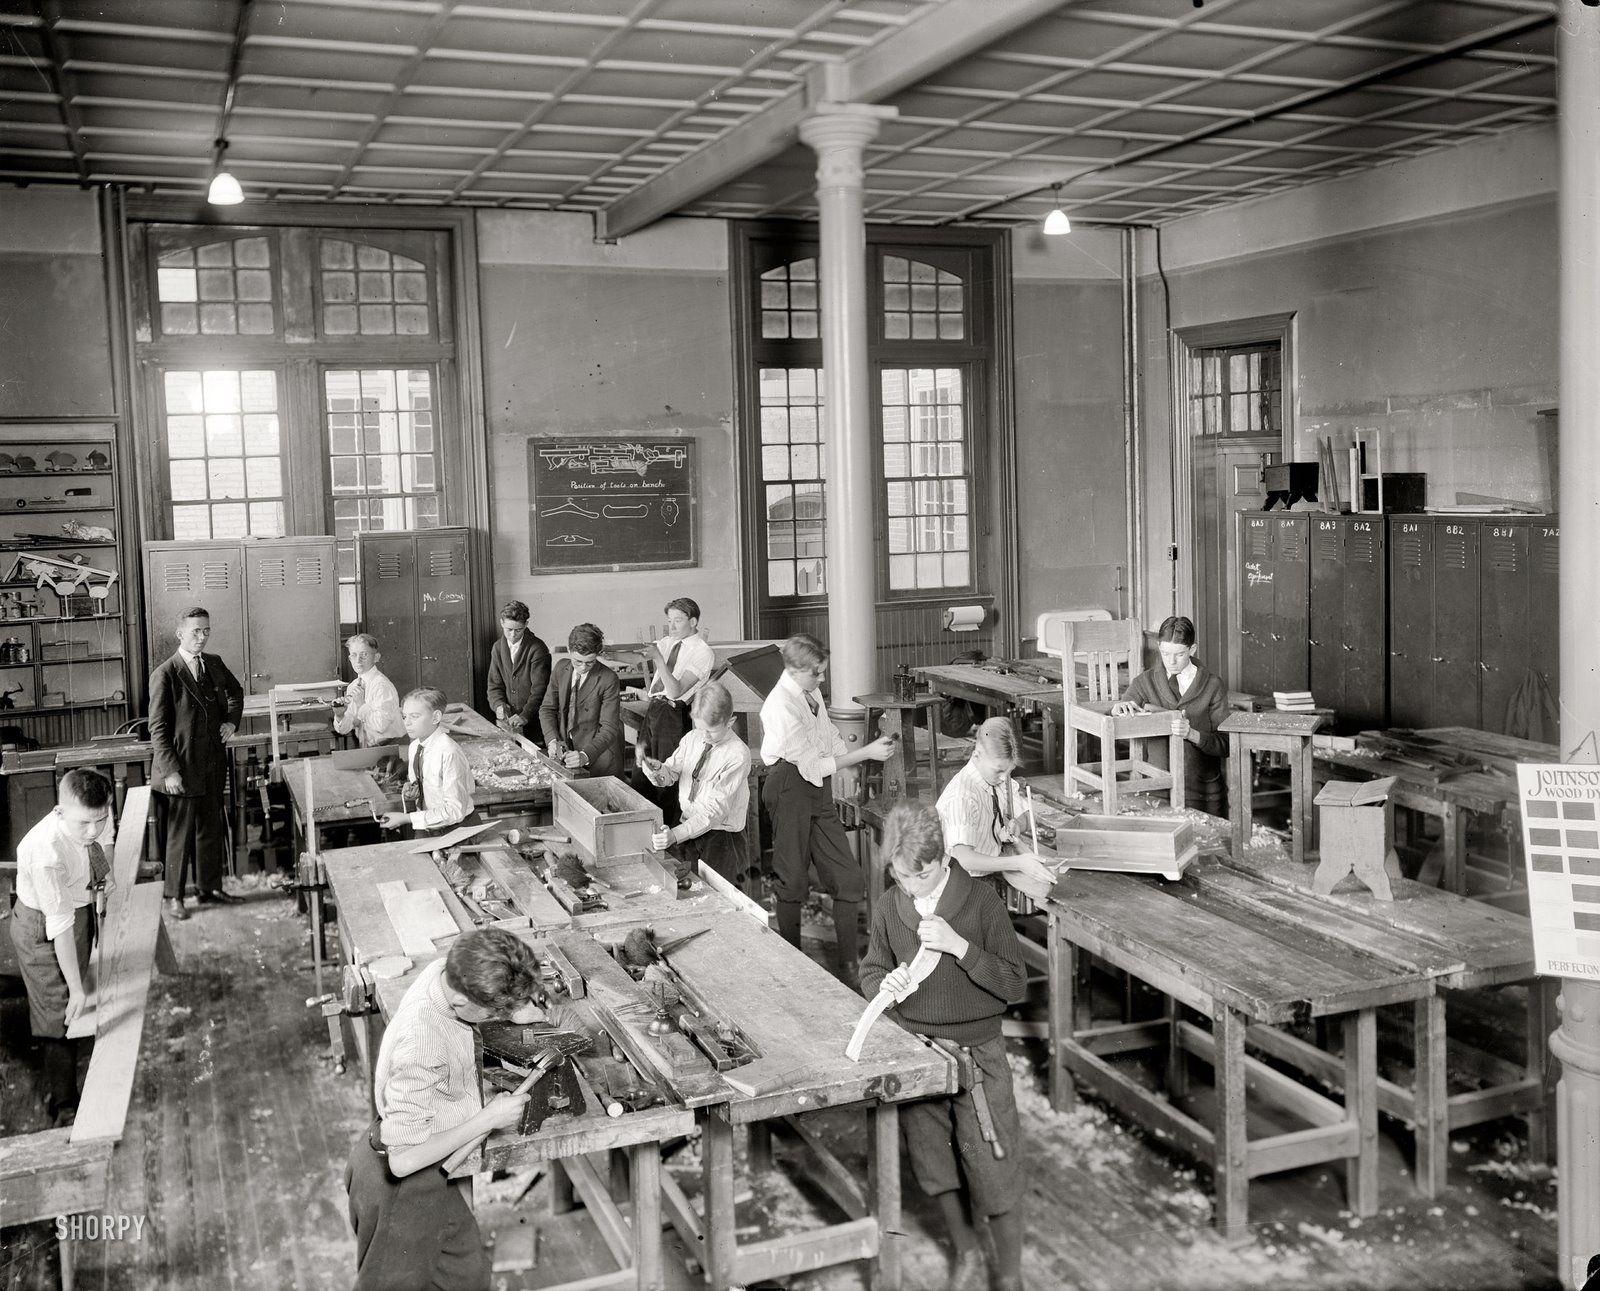 Tywkiwdbi Tai Wiki Widbee Junior High Shop Class 1921 Old